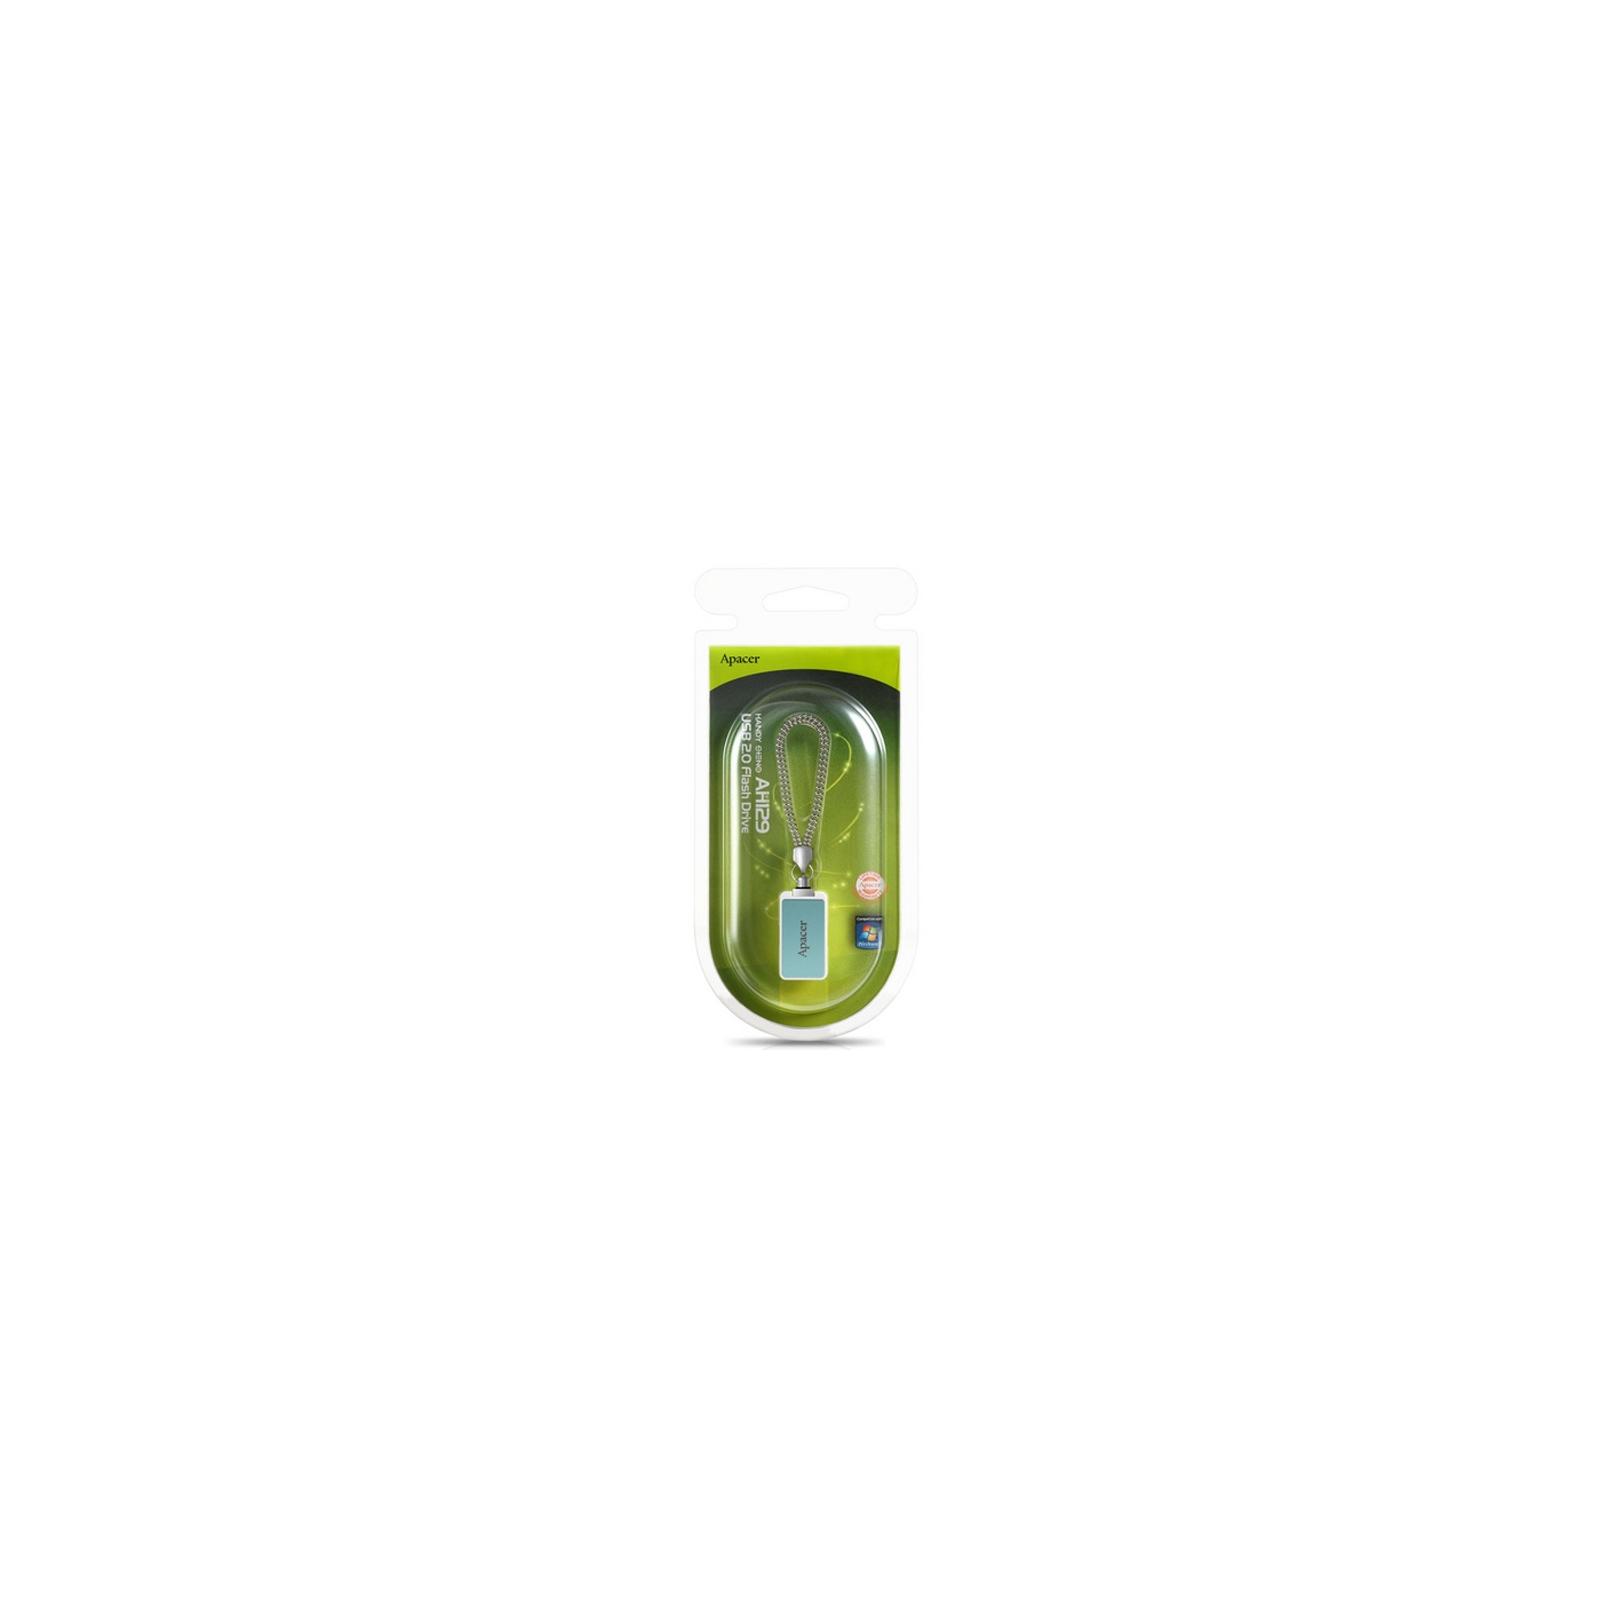 USB флеш накопитель 8GB AH129 Tiffany Blue RP USB2.0 Apacer (AP8GAH129G-1) изображение 7